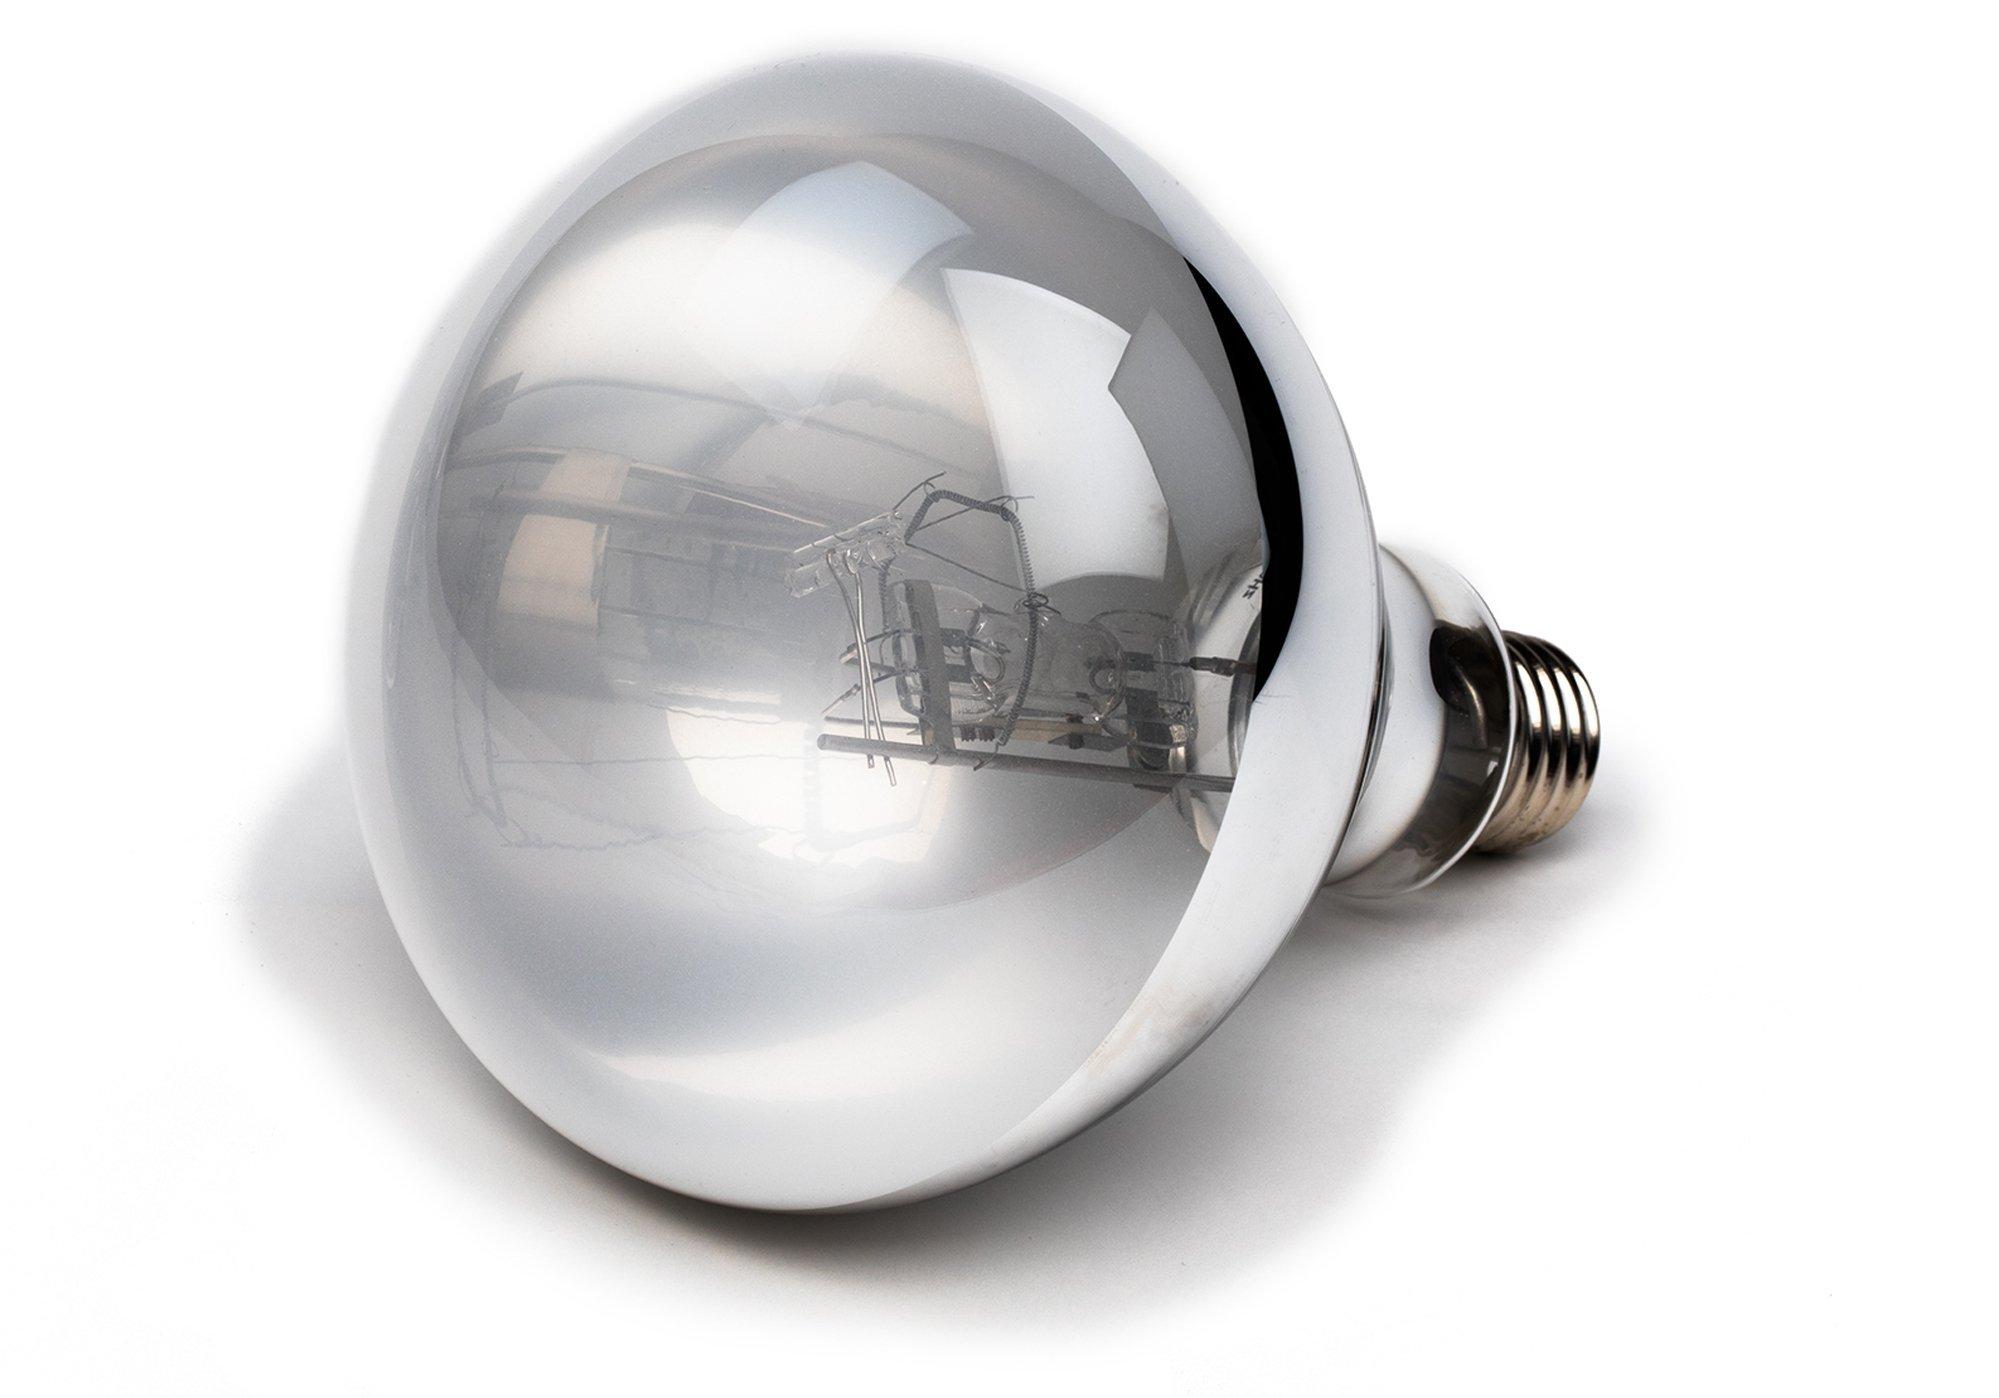 Evergreen Pet Supplies 100 Watt UVA UVB Mercury Vapor Bulb/Lamp/Light for Reptile and Amphibian Use - Excellent UVA UVB Reptile Light/Reptile Bulb